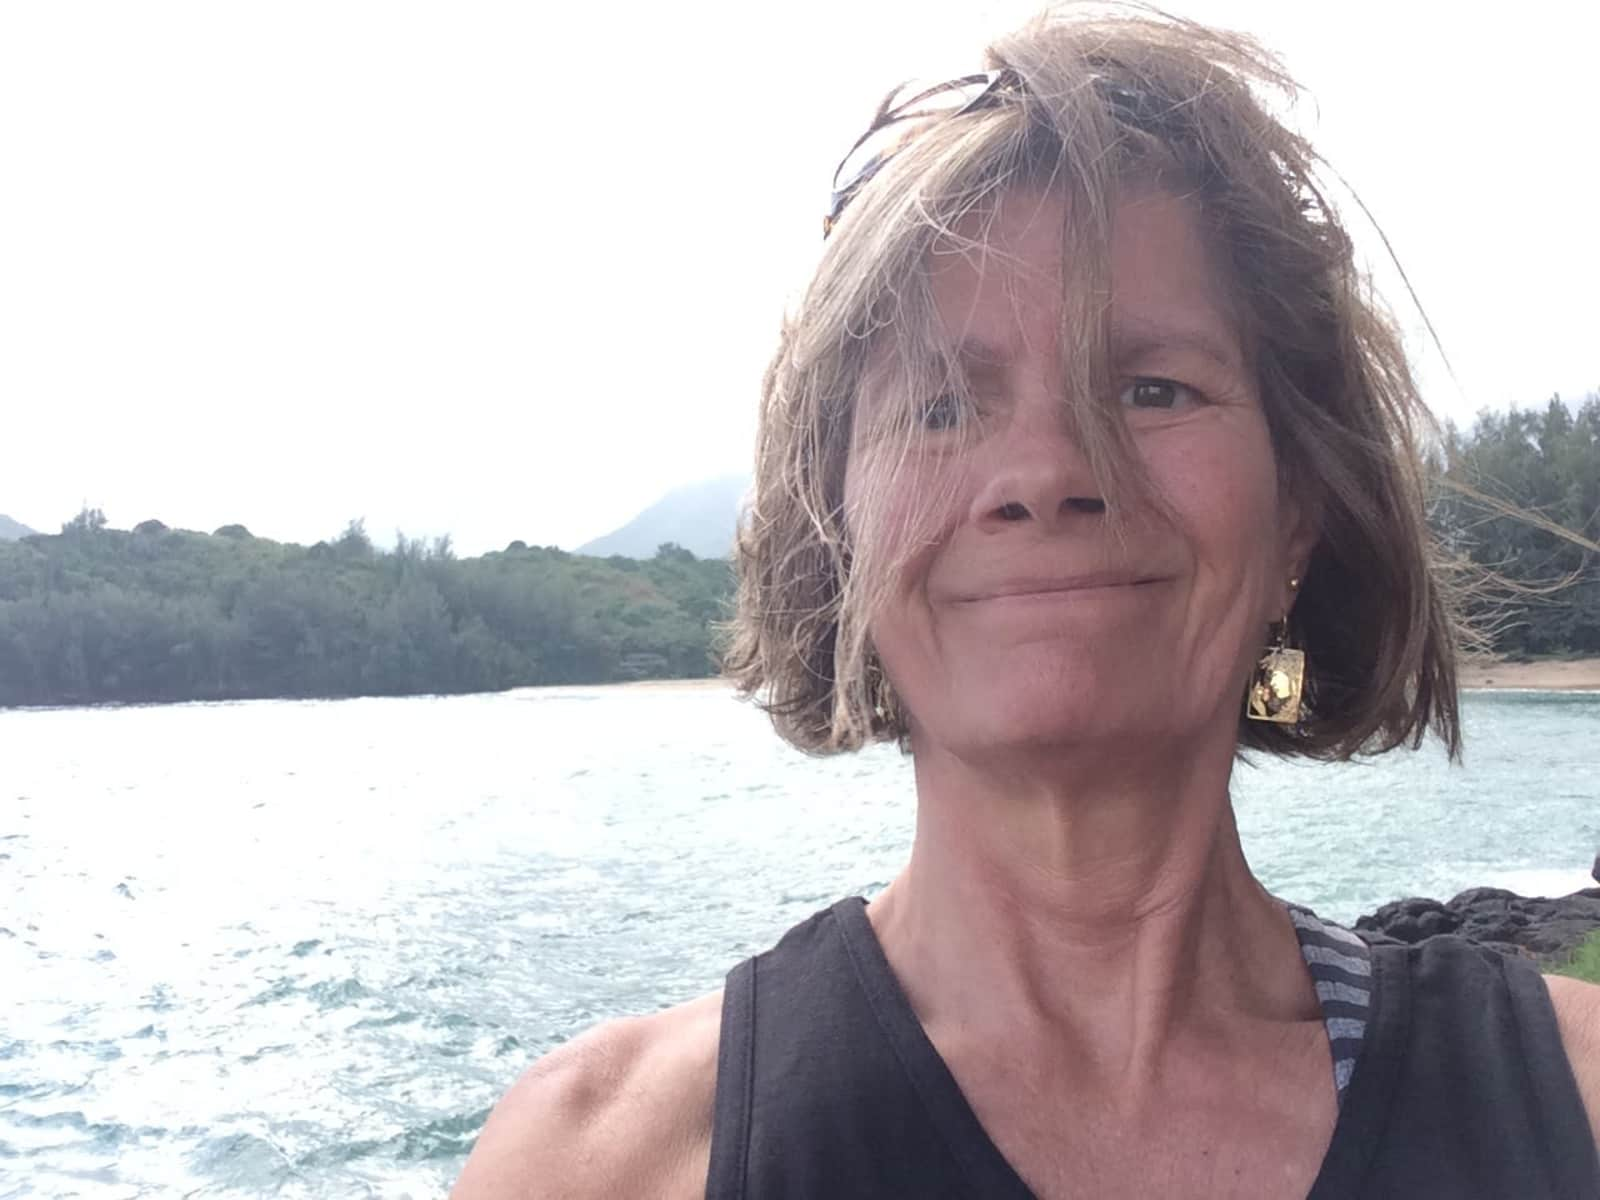 Patrice from Lake Junaluska, North Carolina, United States